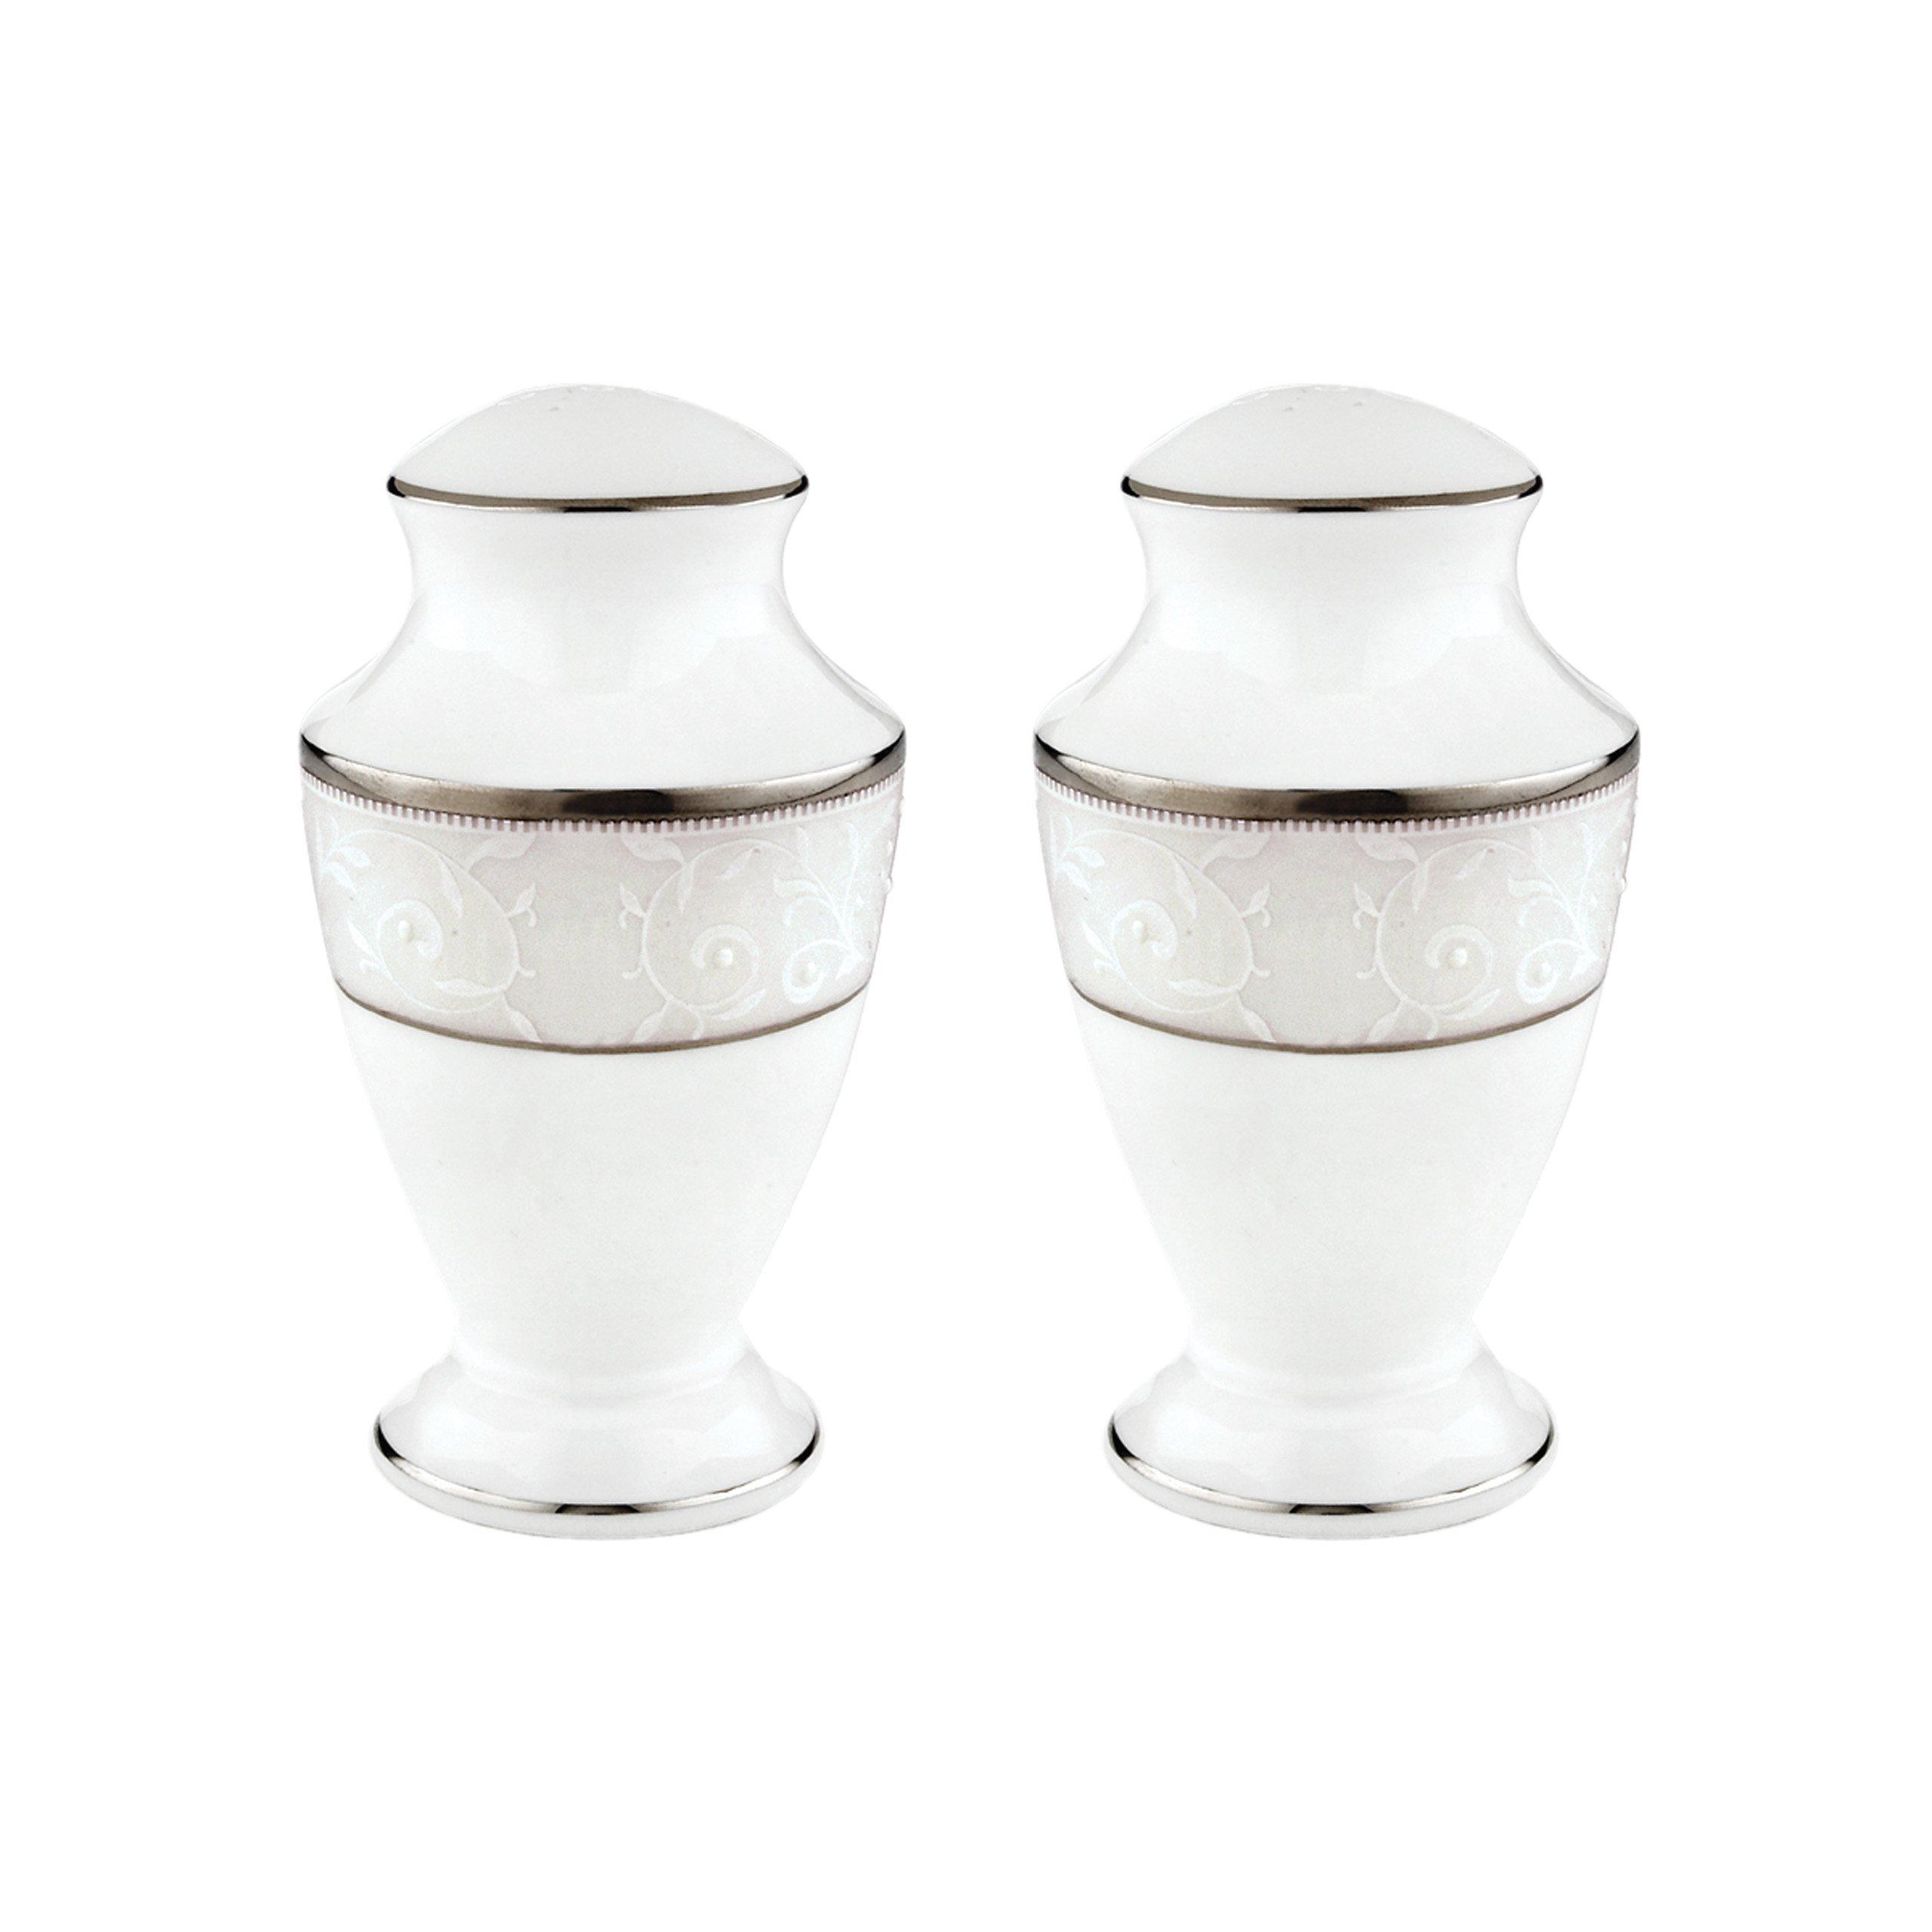 Lenox Opal Innocence Salt and Pepper Set, White by Lenox